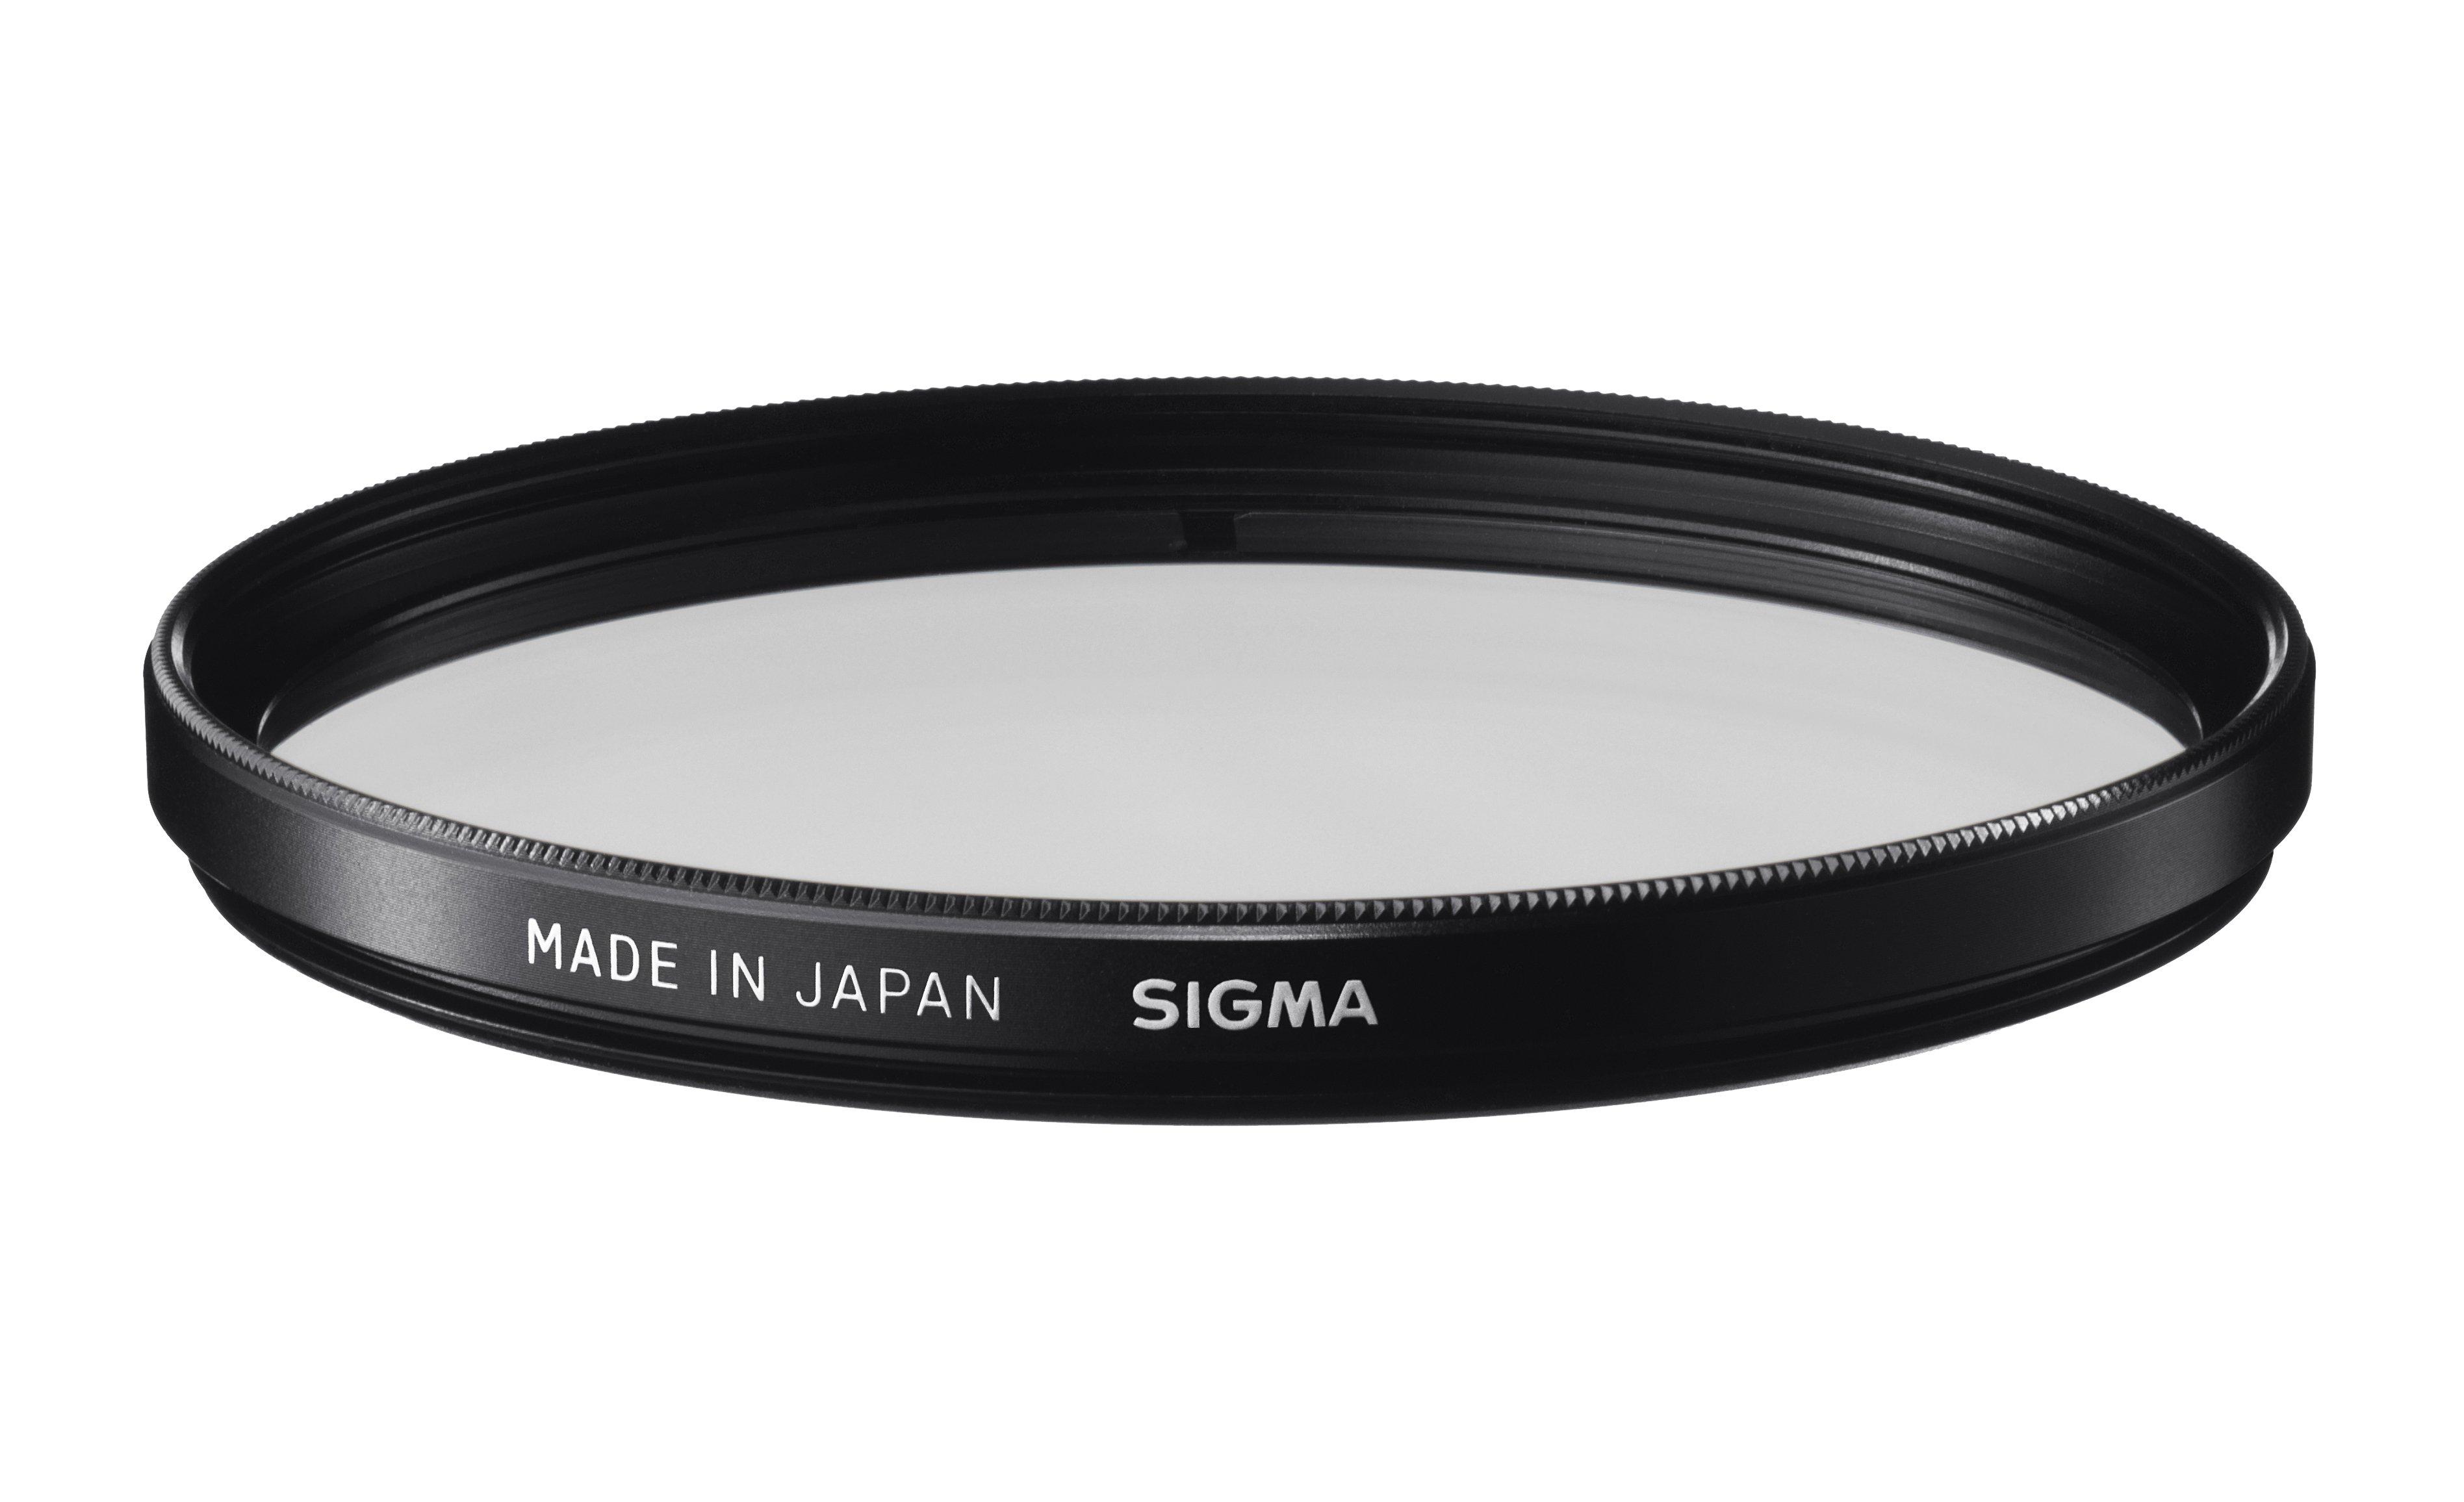 SIGMA filtr UV 62 mm WR